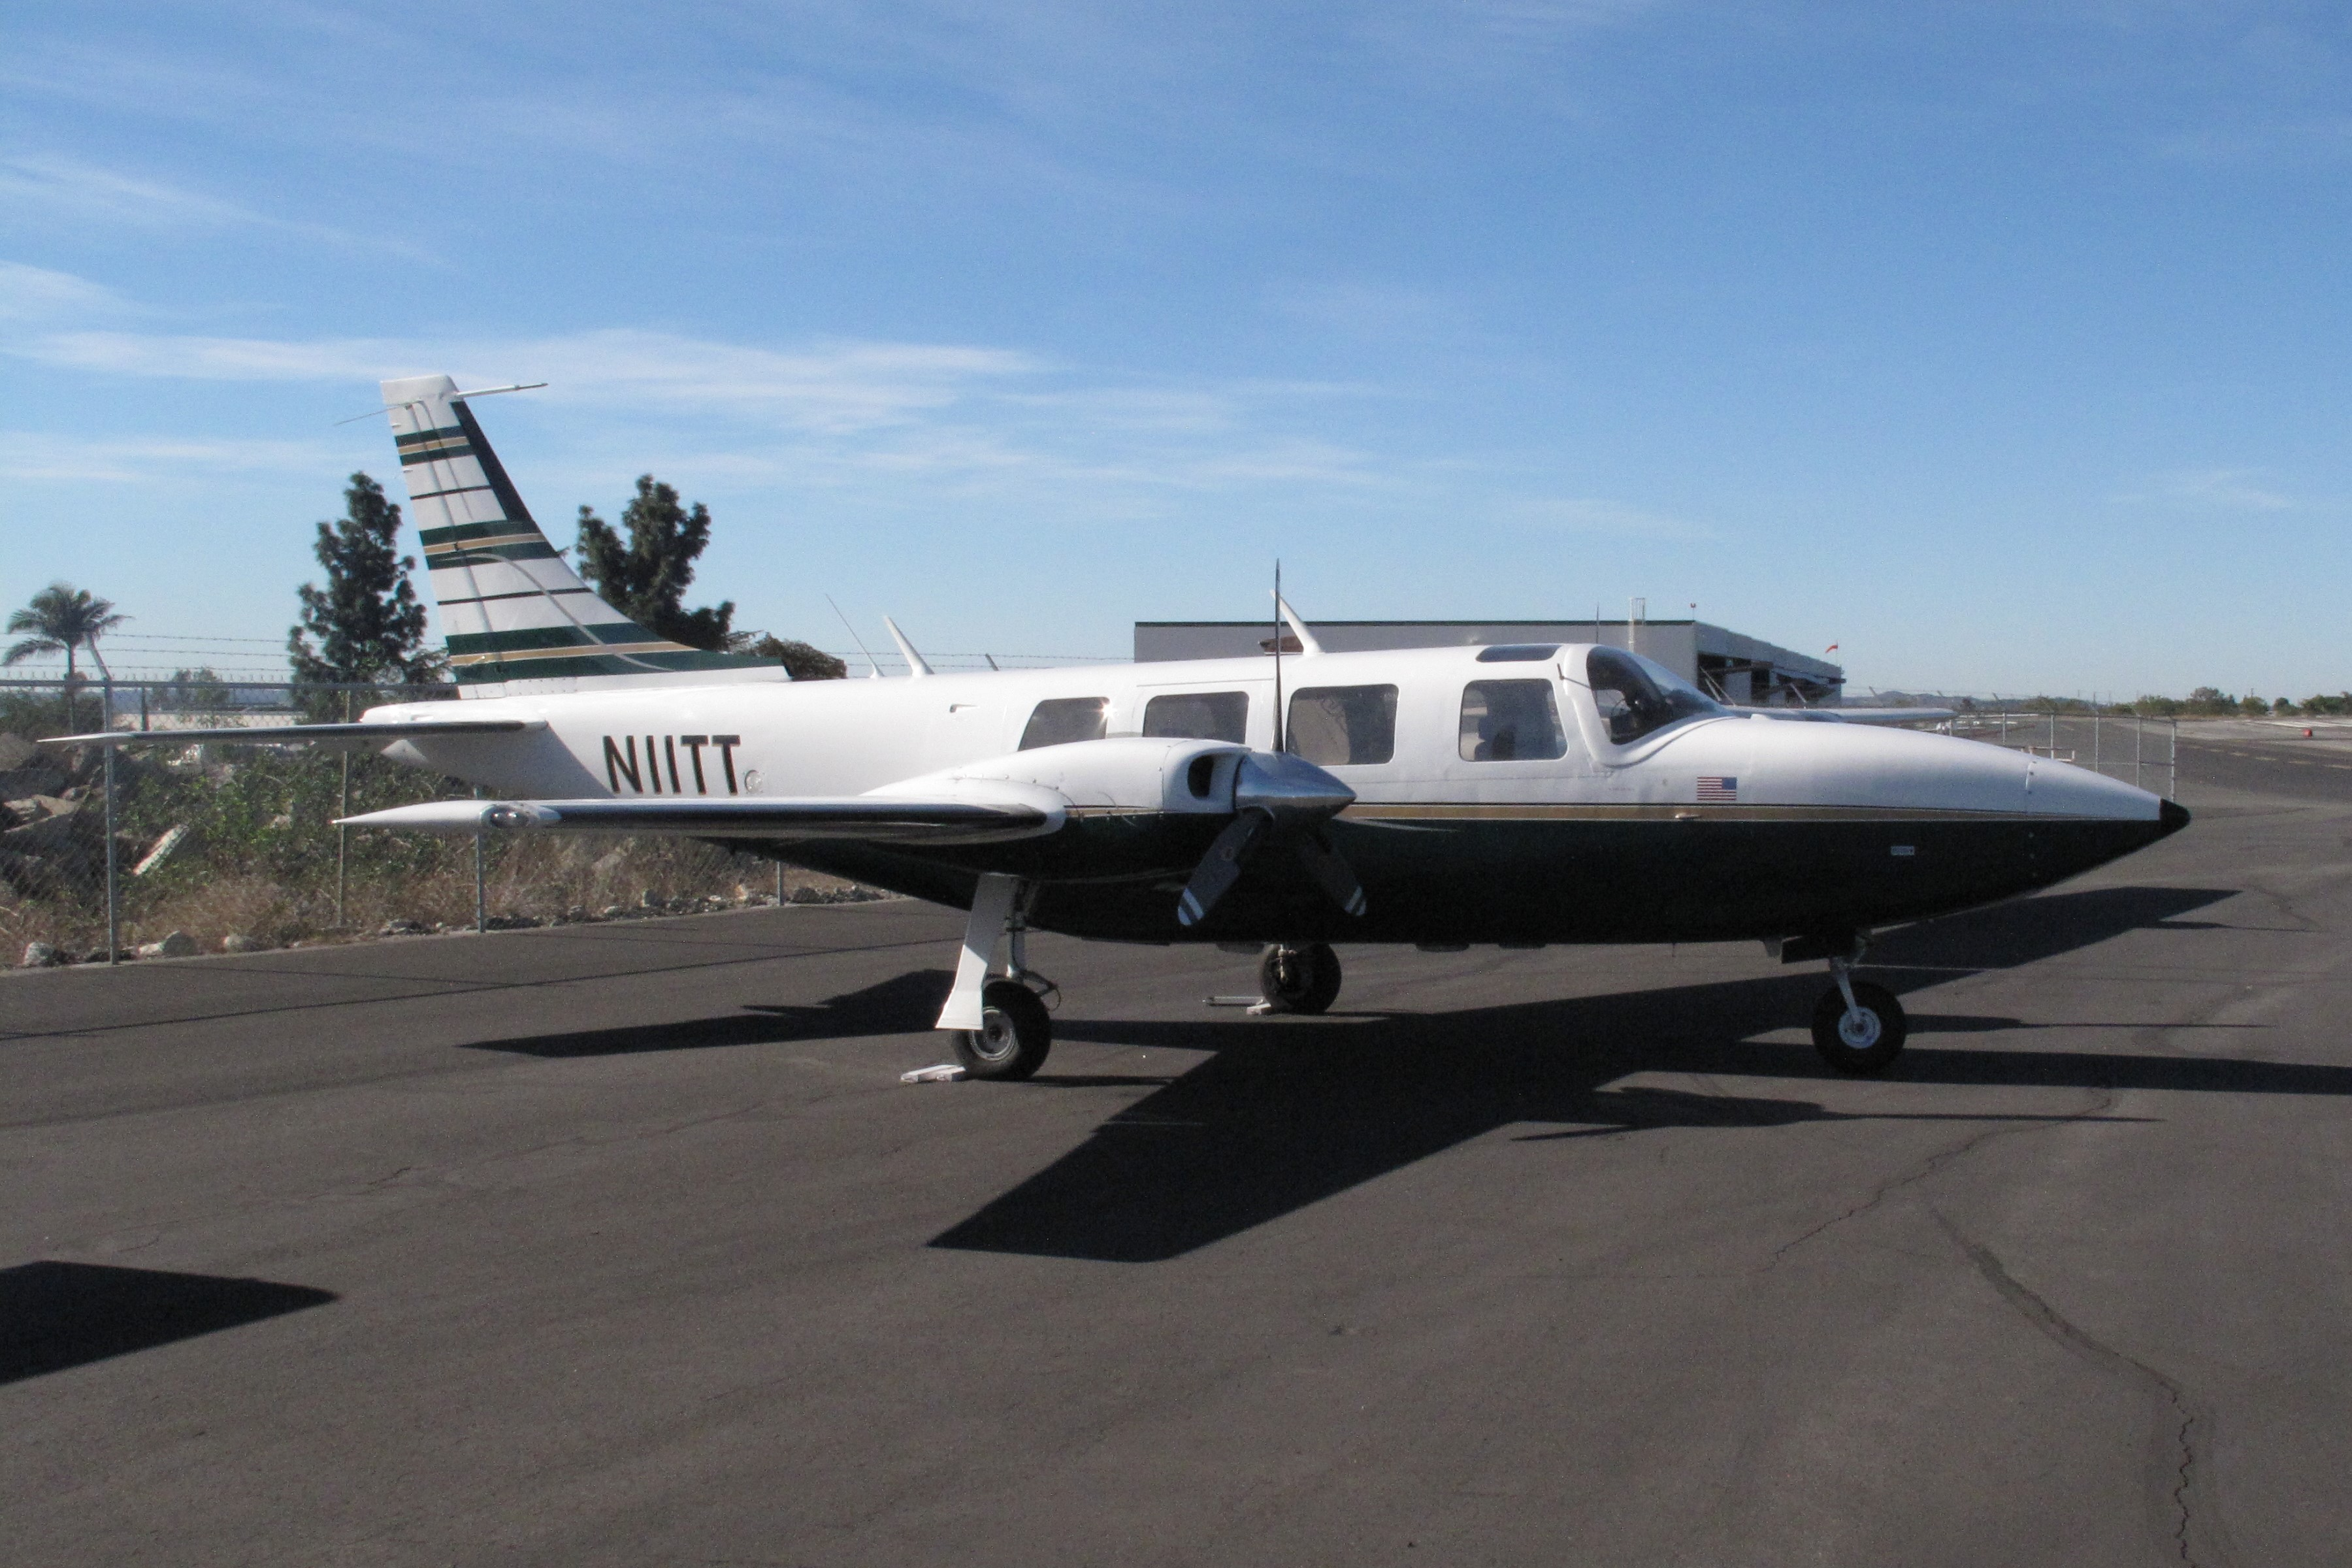 Piper Aerostar 601 Twin Engine Light Transport Aircraft Air Craft Warning Circuit History